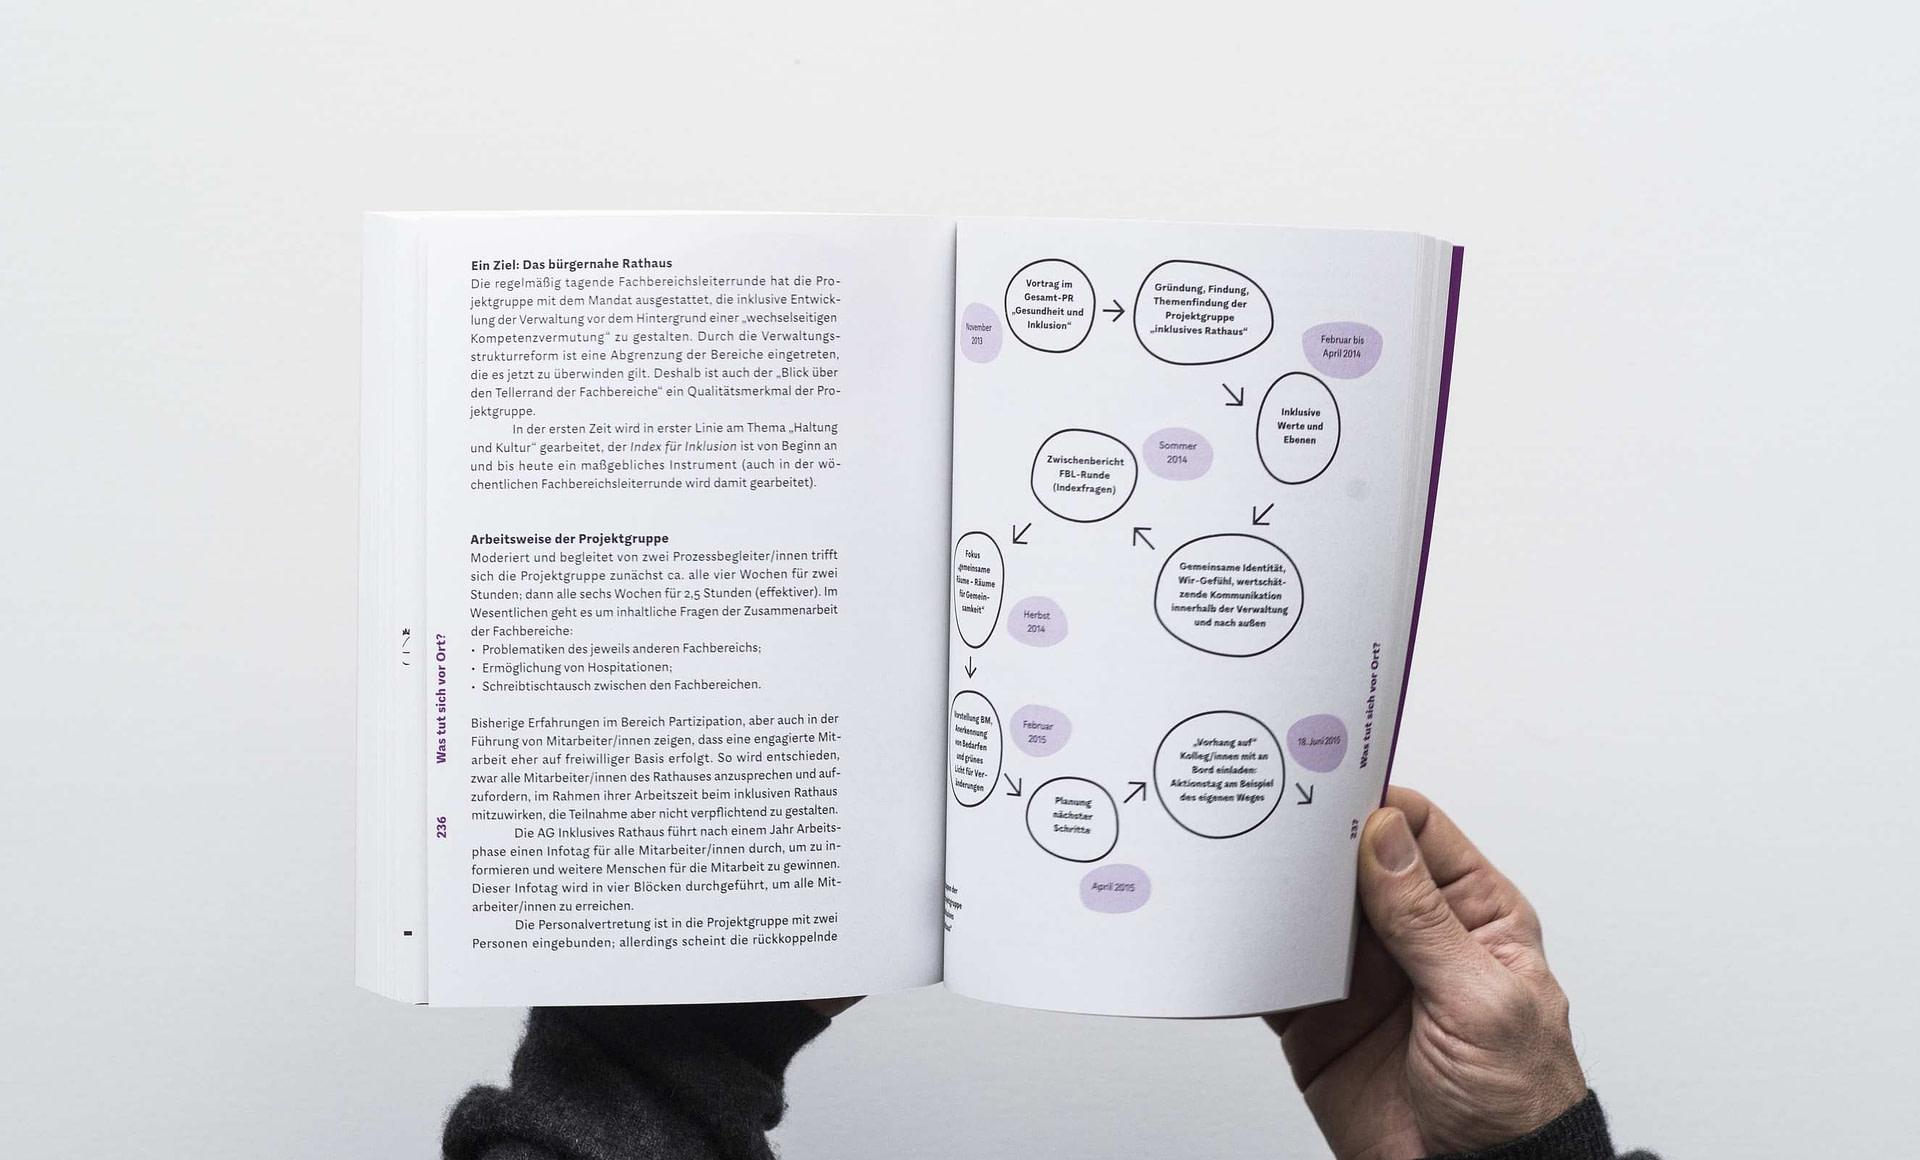 inclusion-fieldbook-23-2650x1600px